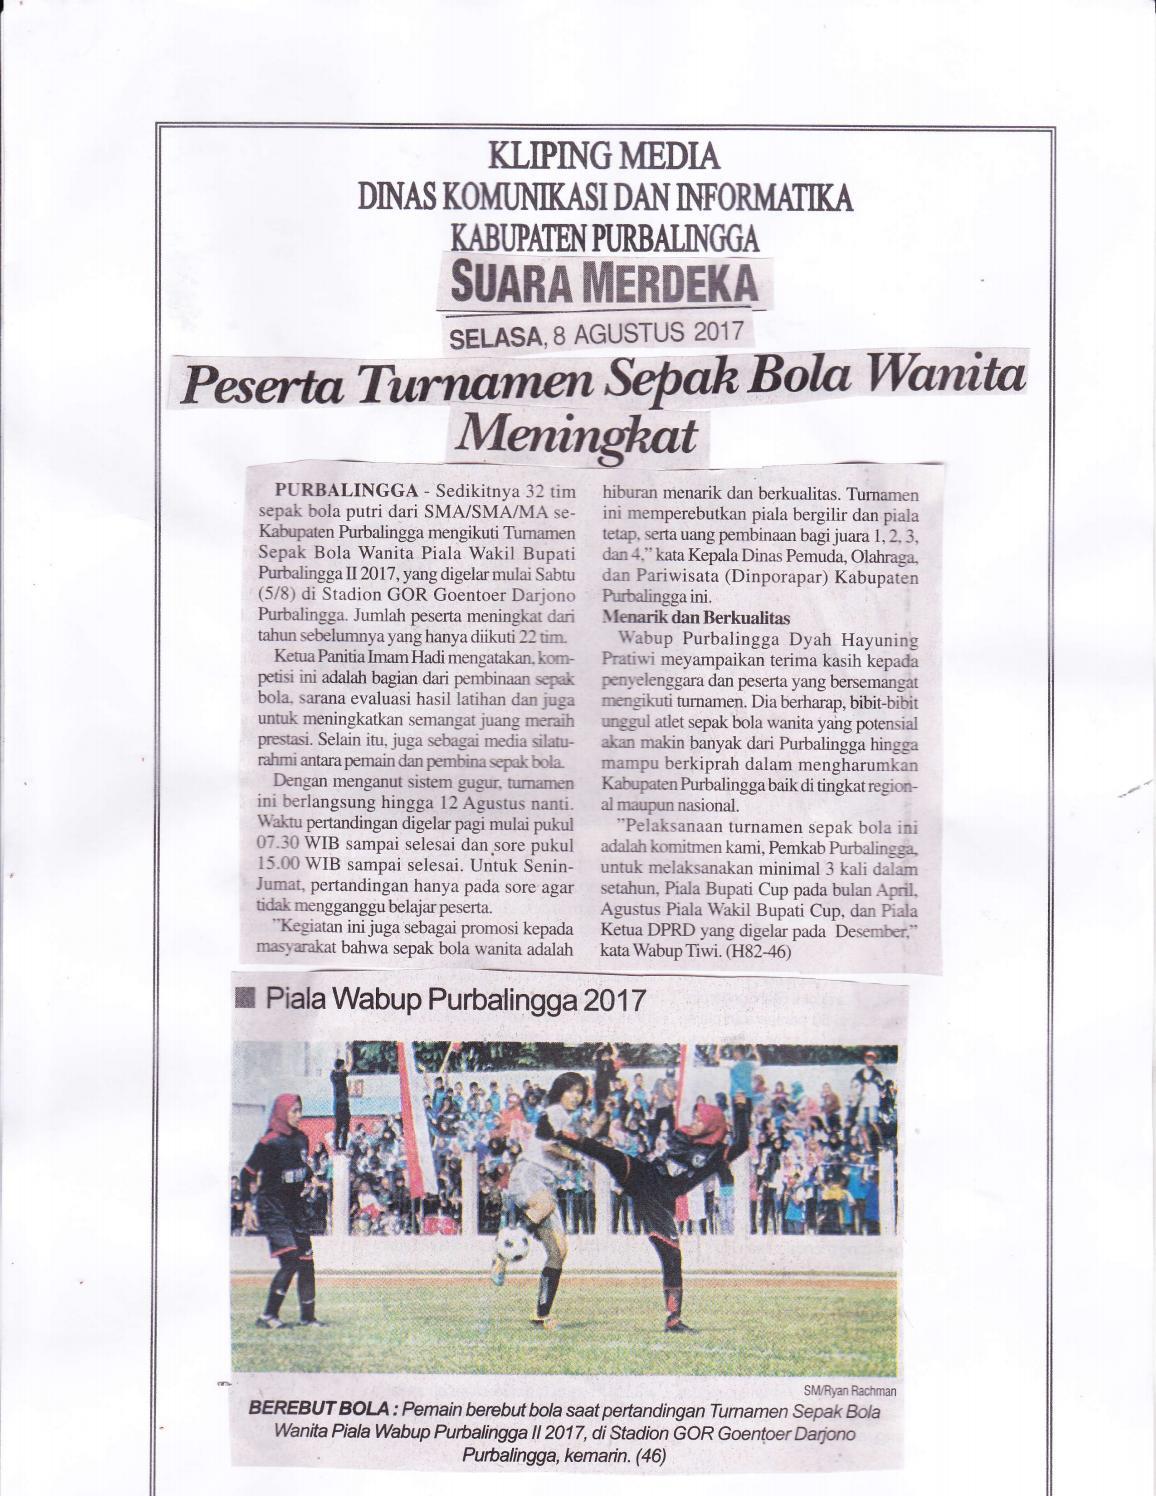 Contoh Kliping Olahraga Futsal